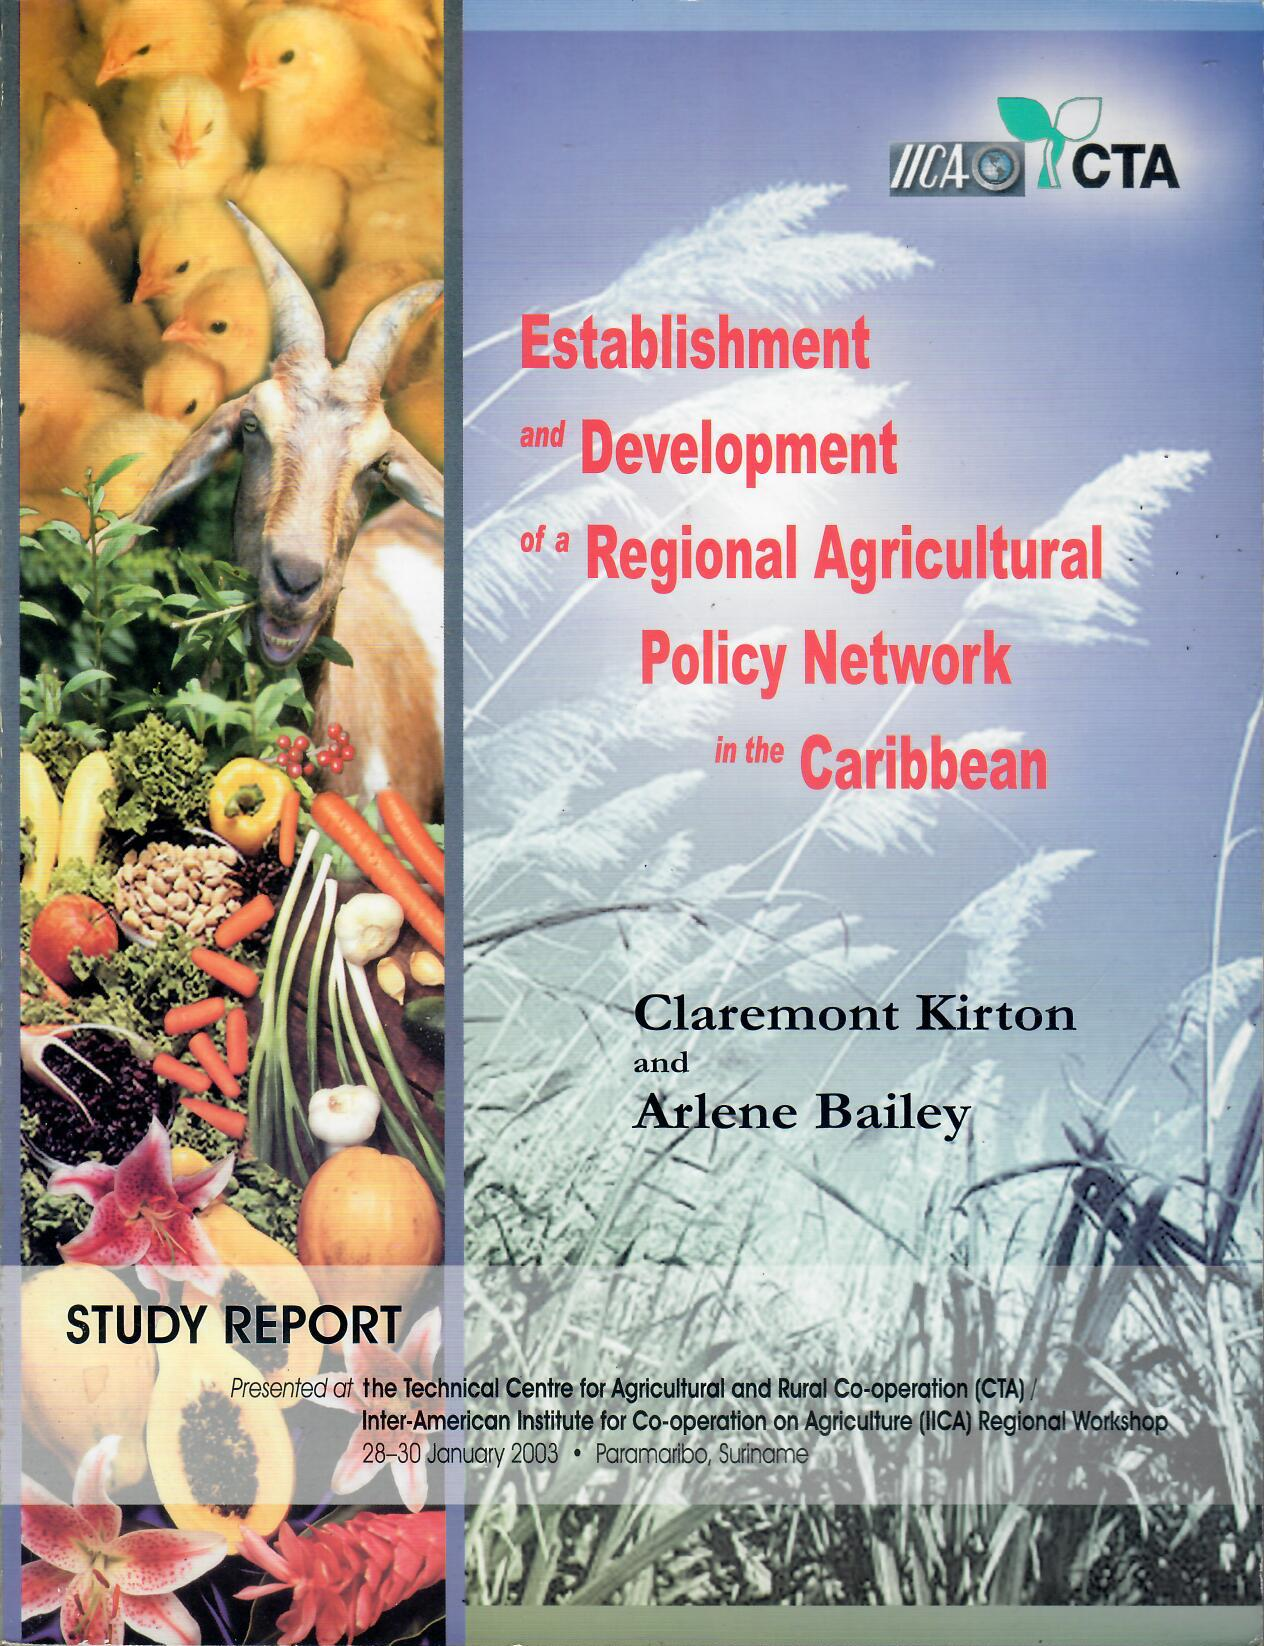 Establishment and Development of a RAPN in the Caribbean